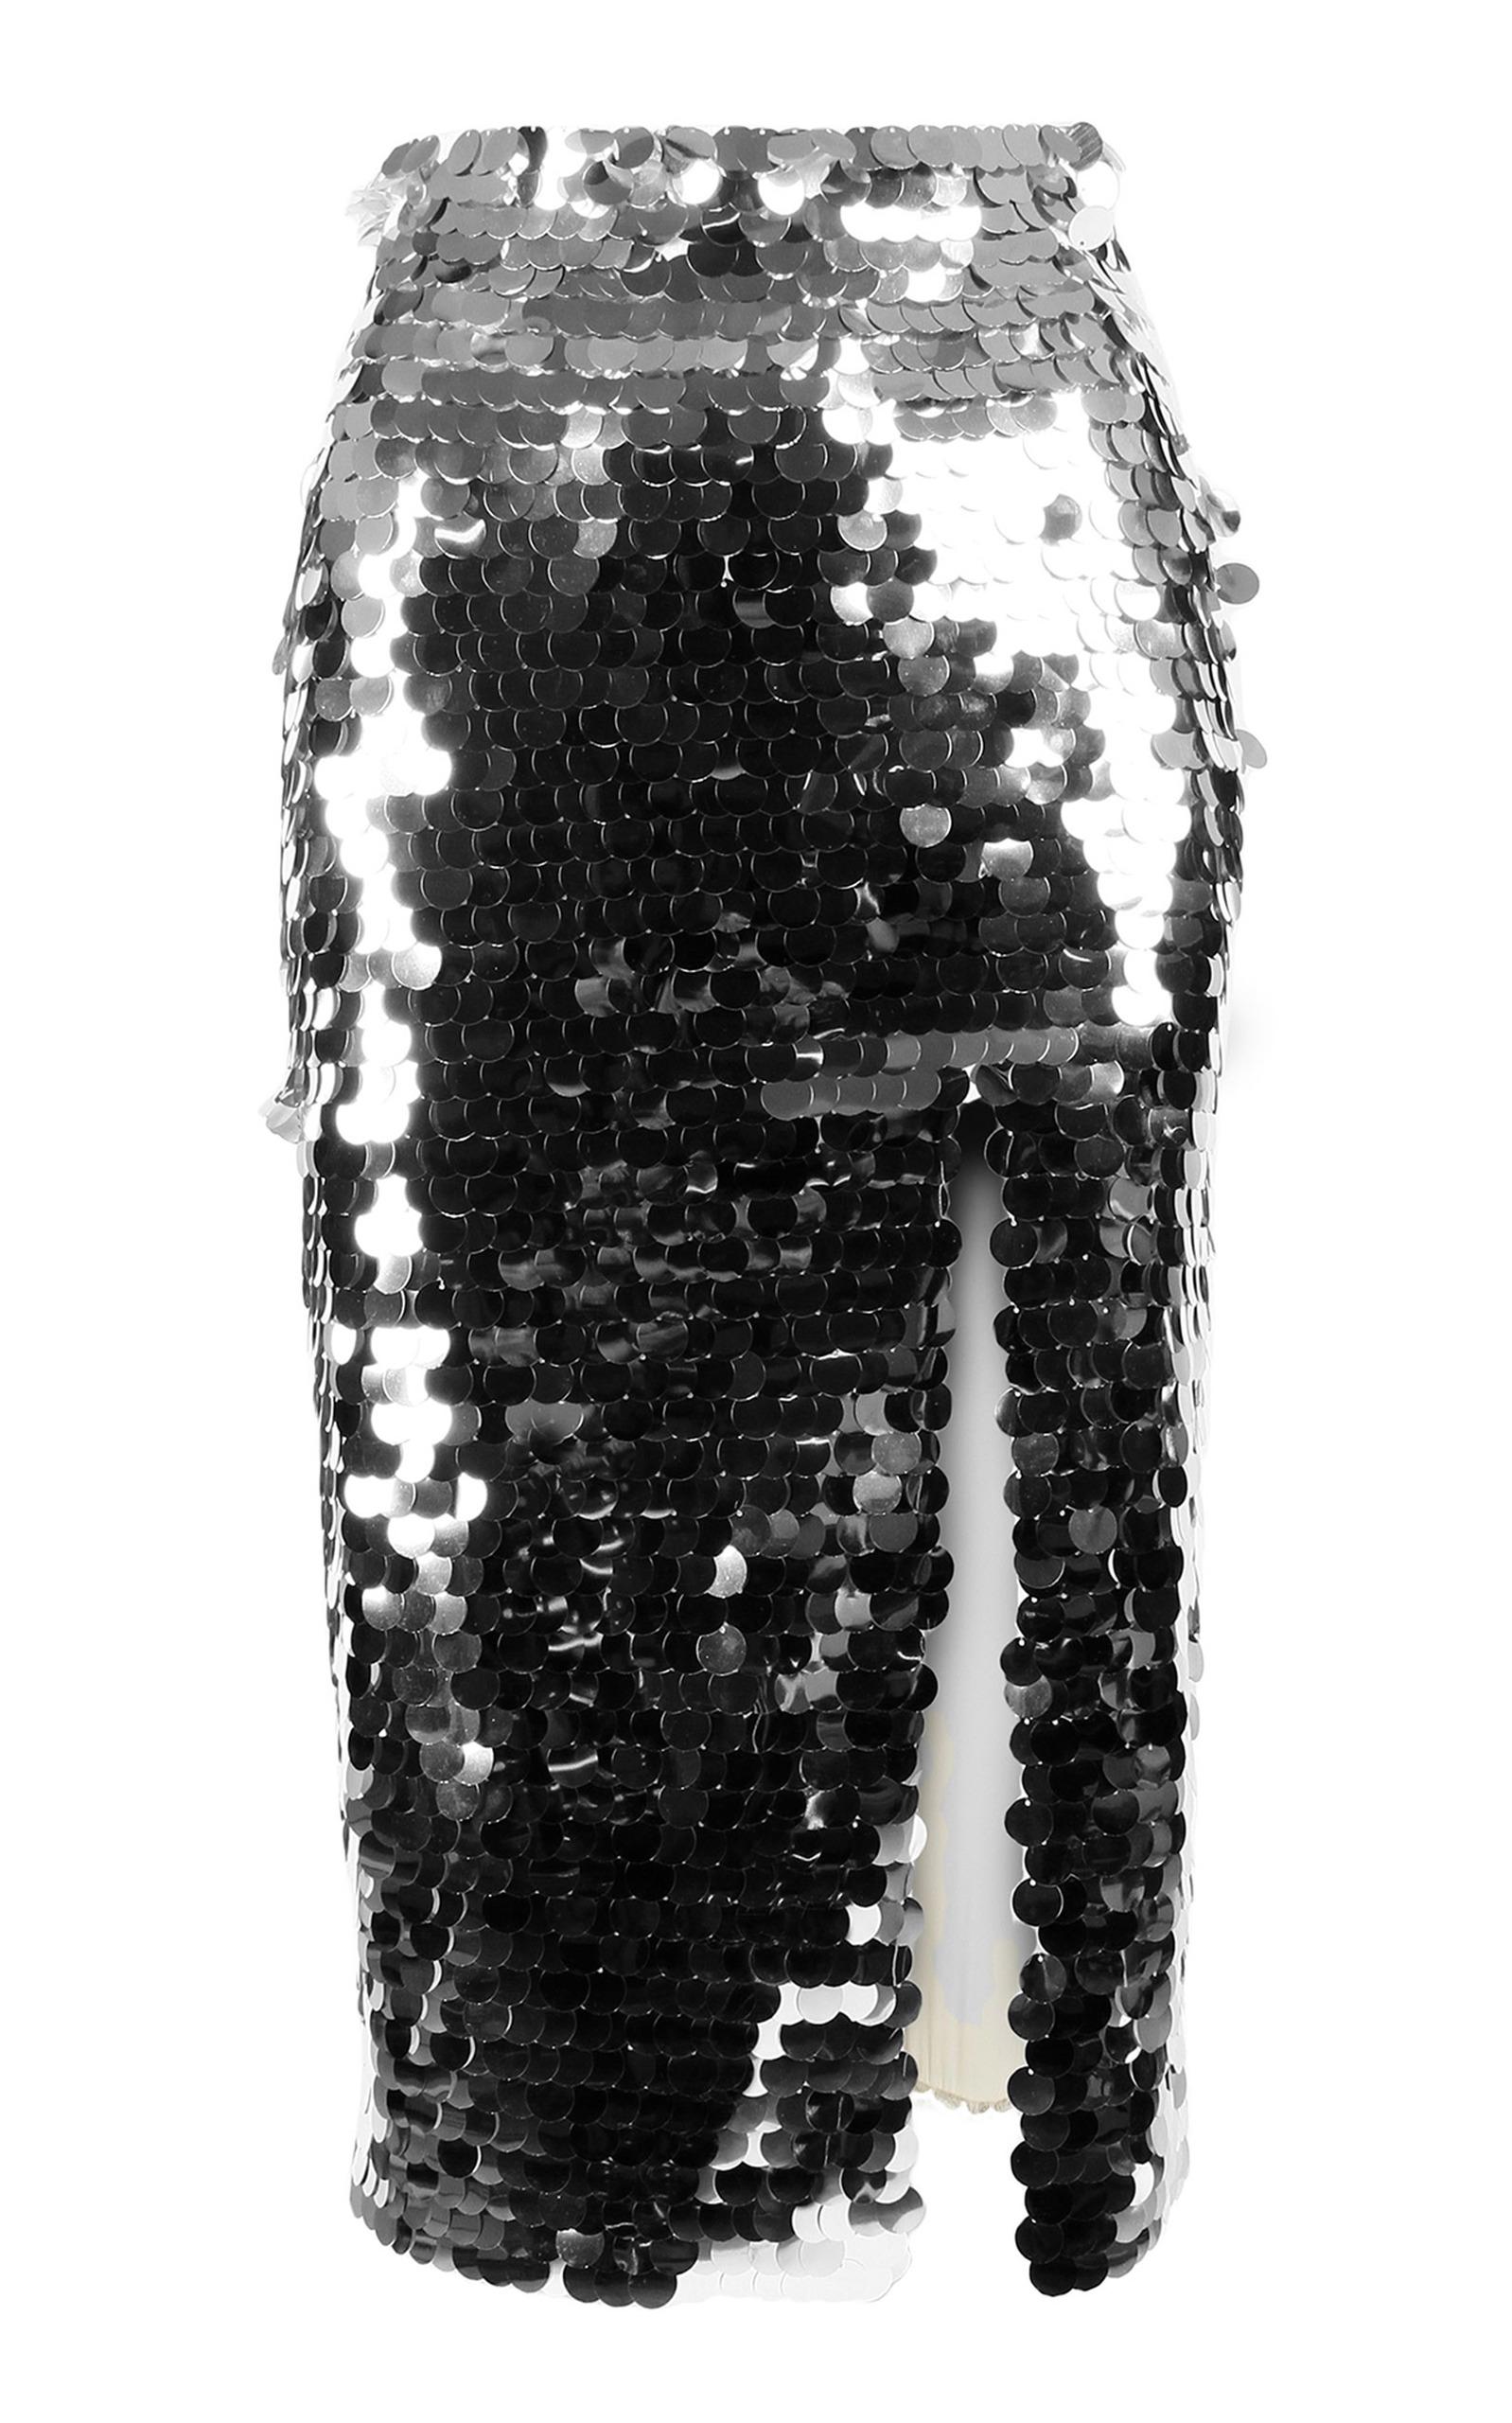 a230cbcbb8ec Sparkly Sequin Pencil Skirt by Anouki | Moda Operandi